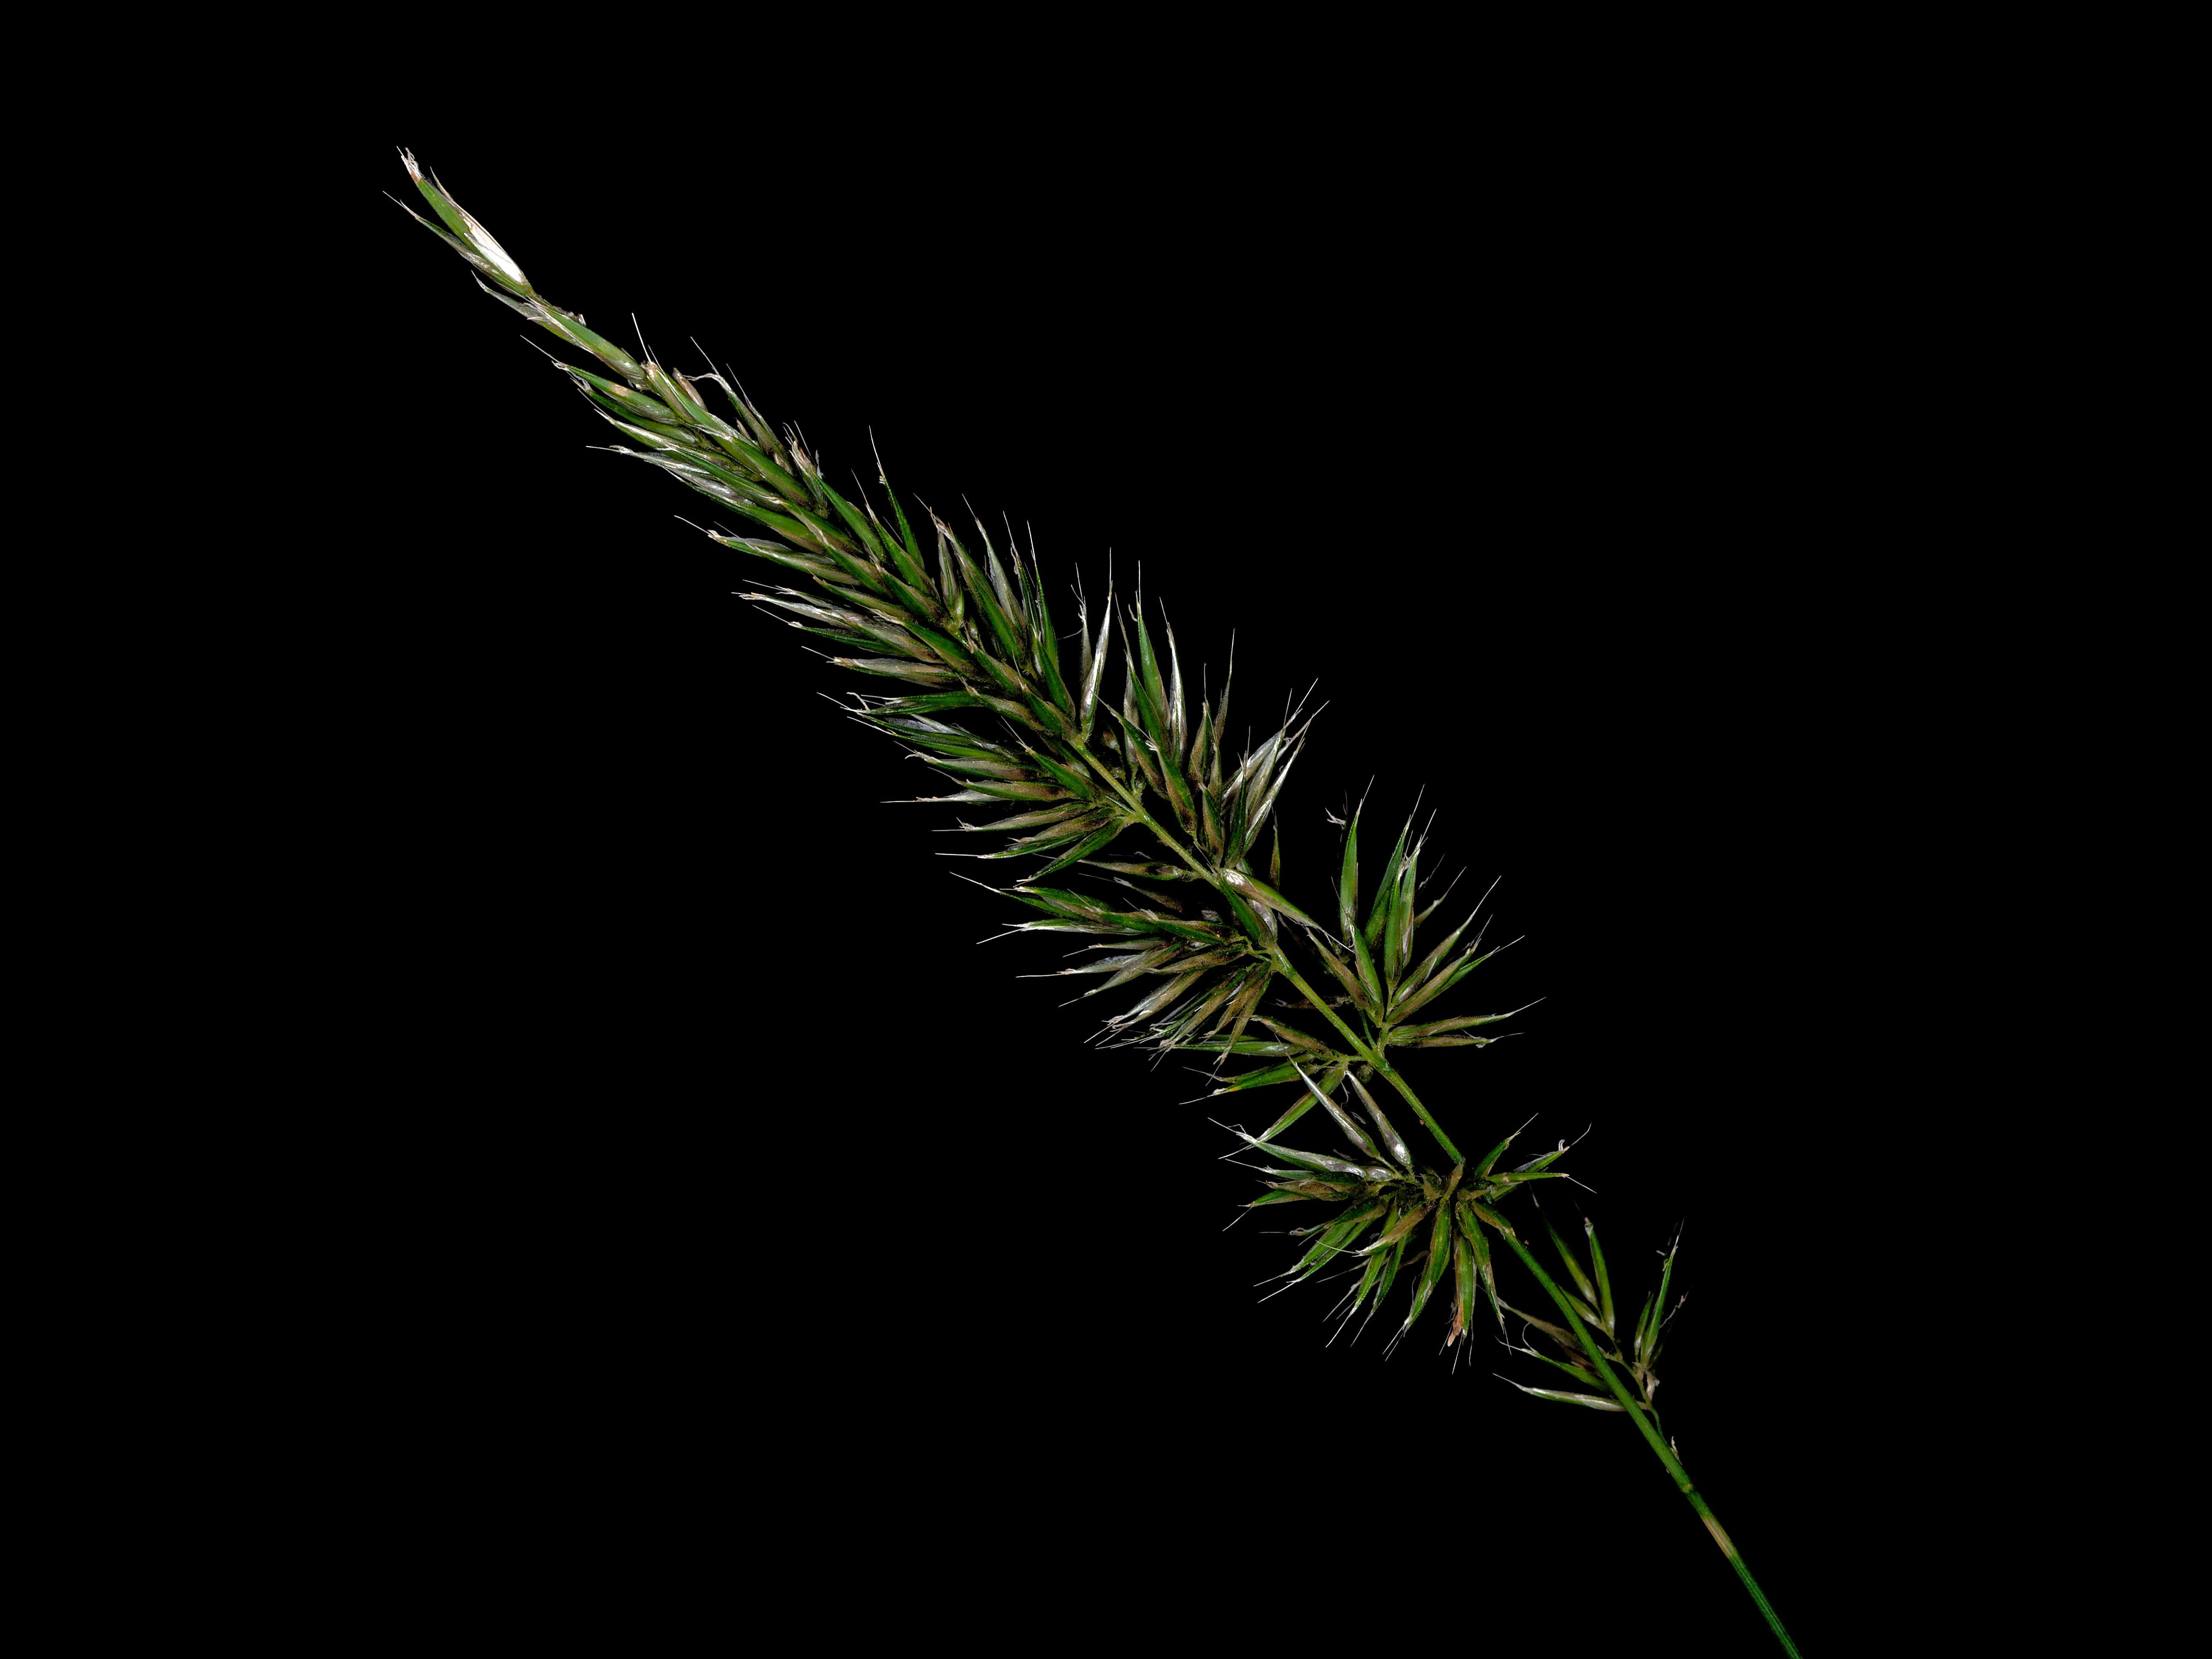 Grasses-12.jpeg